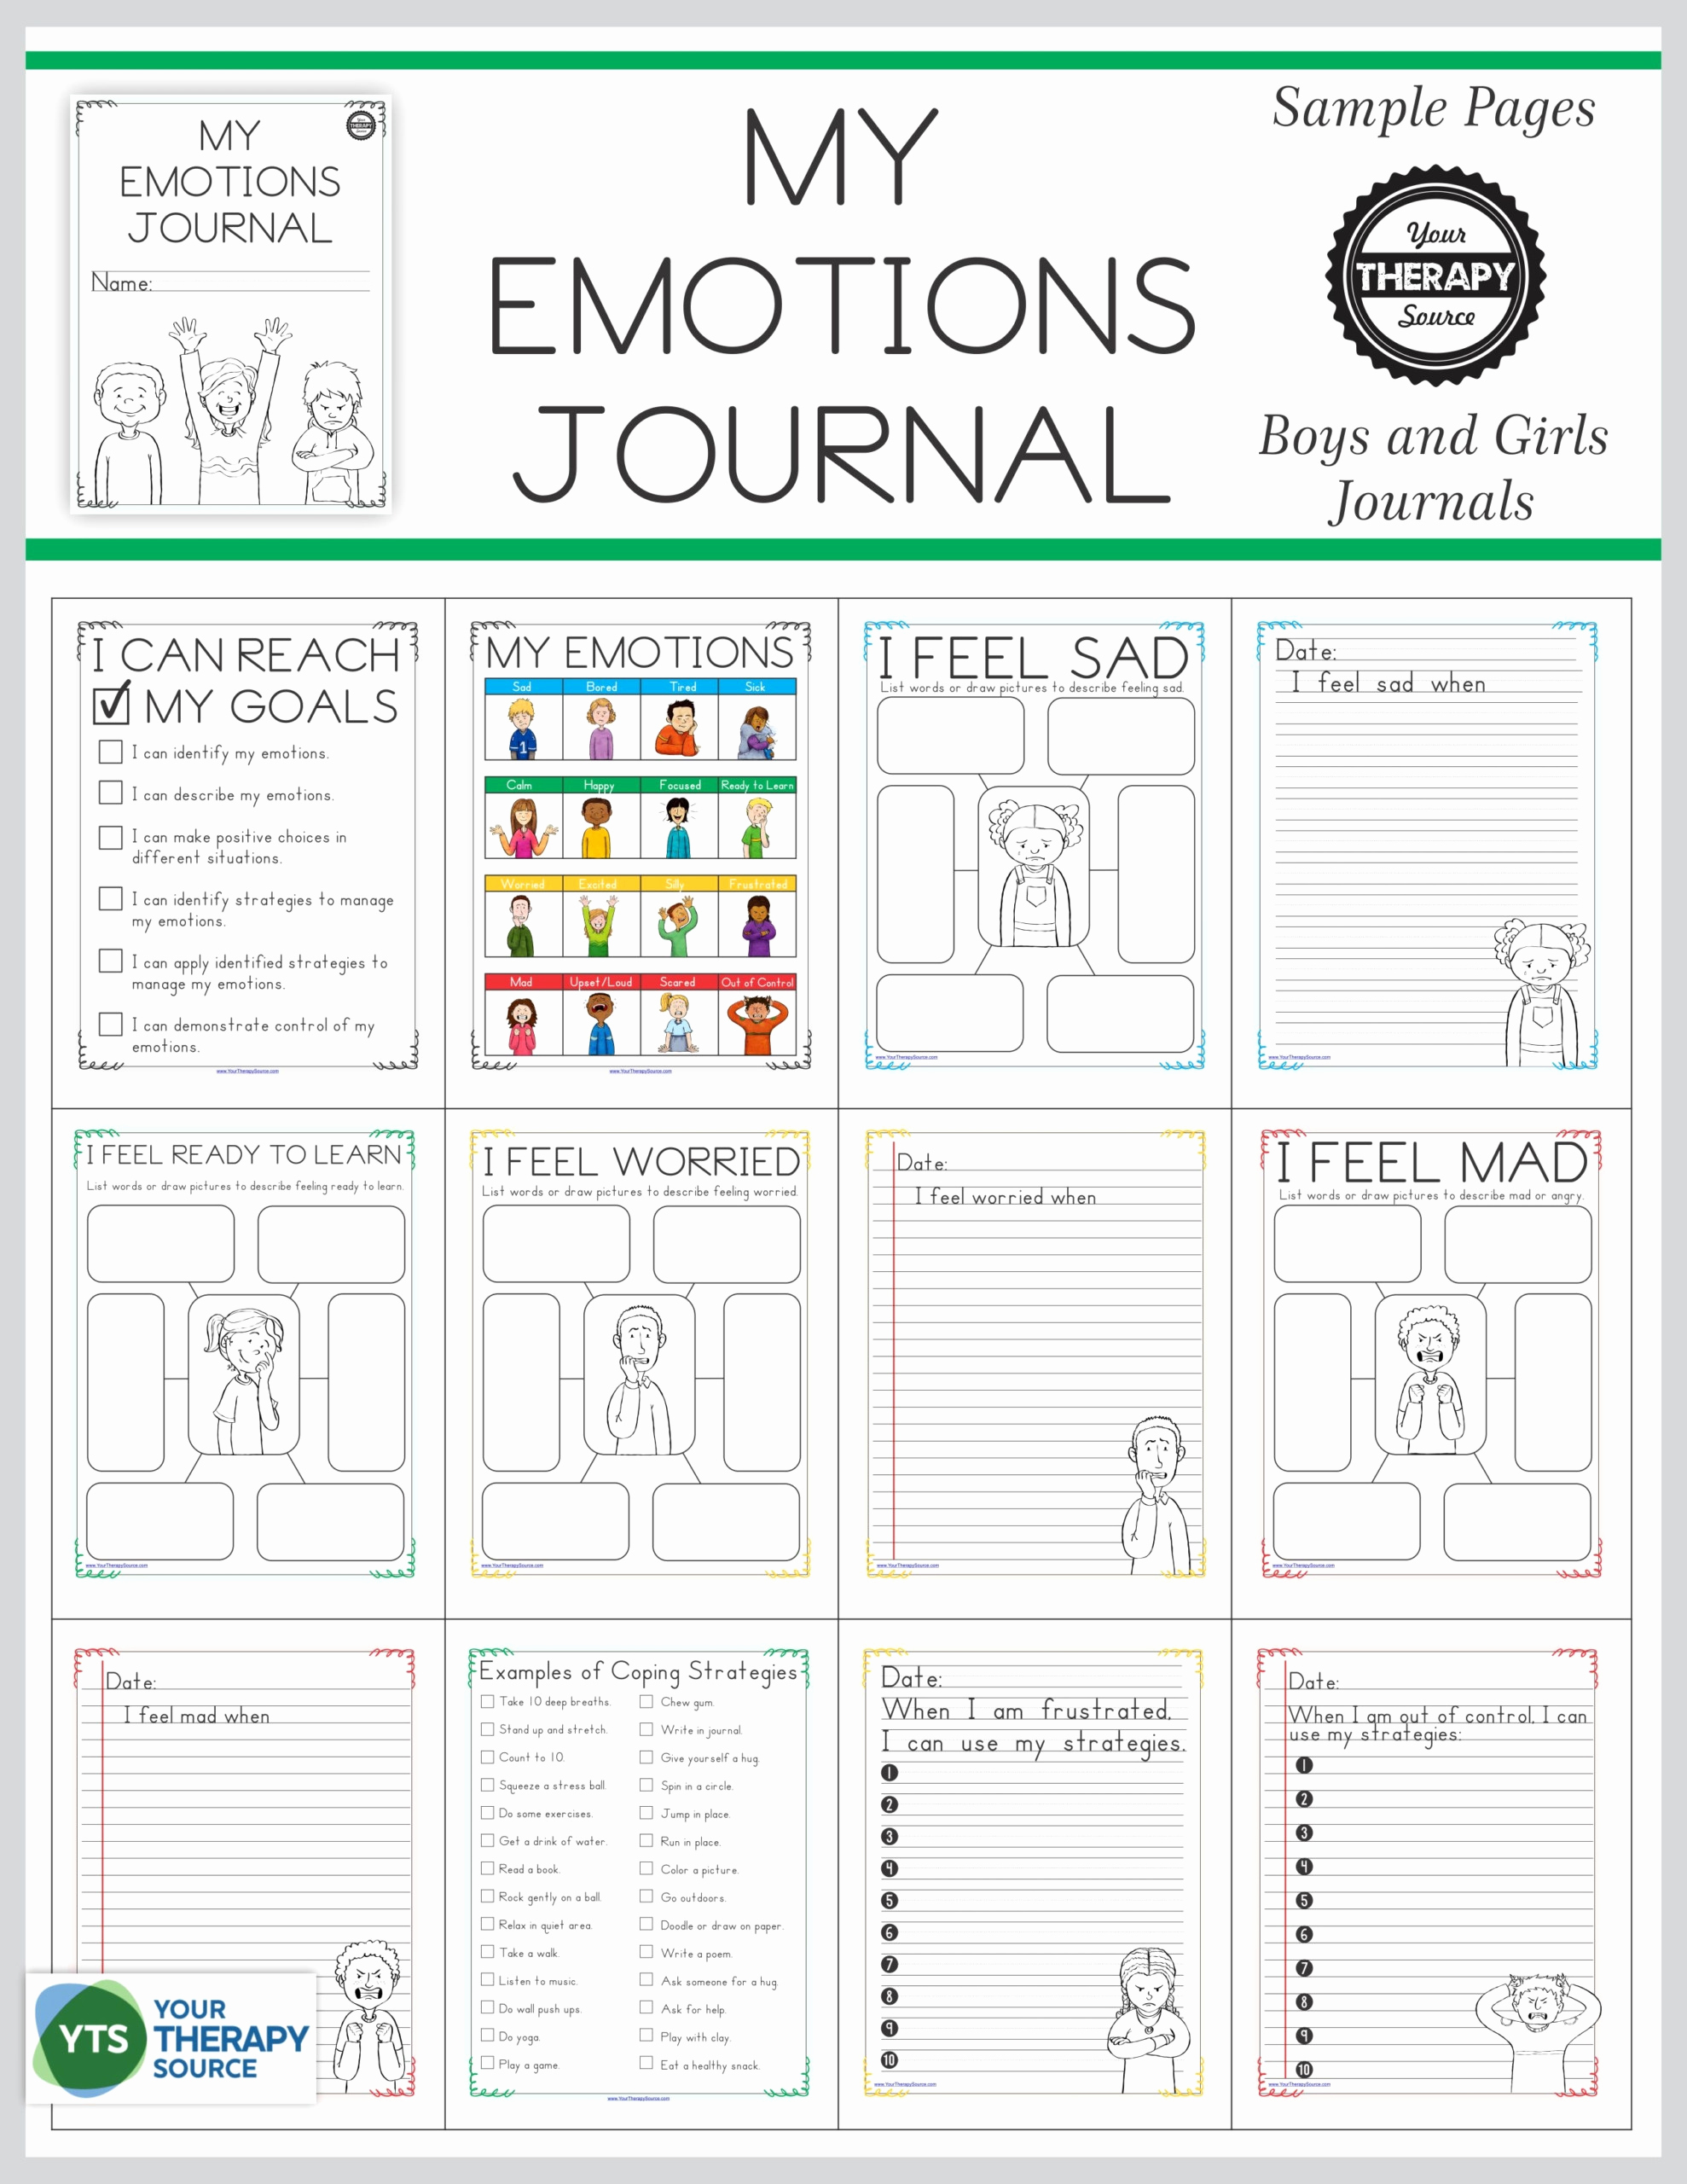 Impulse Control Worksheets Printable Lovely 30 Impulse Control Worksheets for Kids